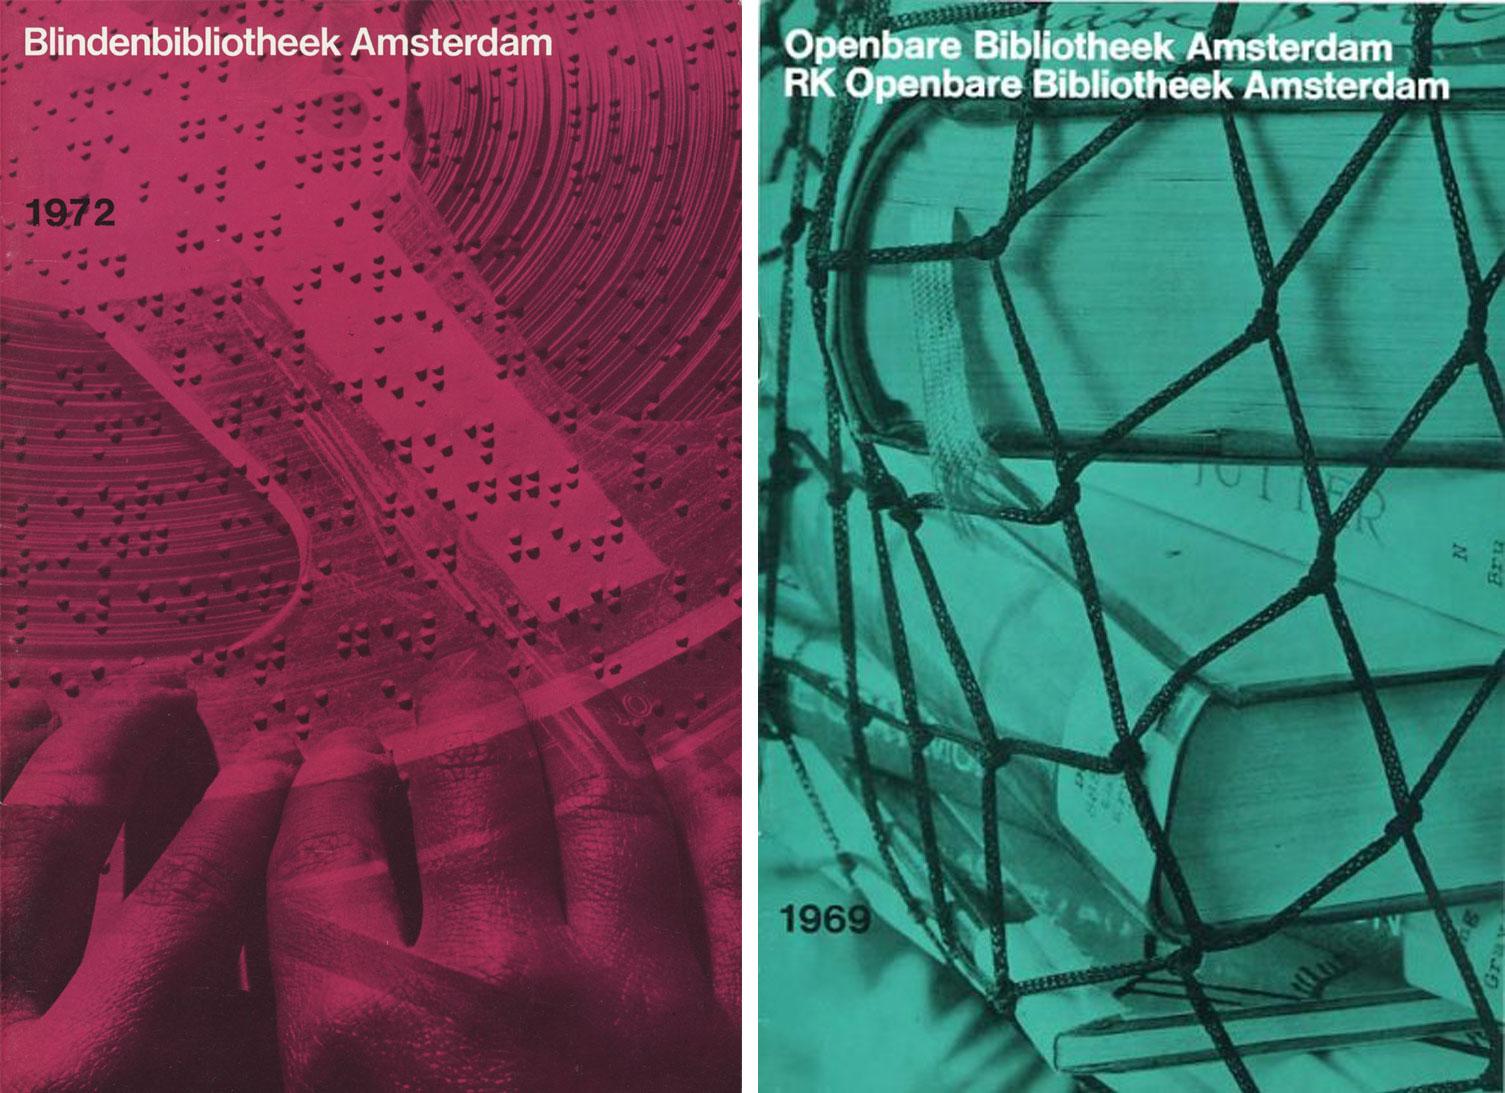 ben-bos-affiches-amsterdam-aveugles-bibliotheques-index-grafik